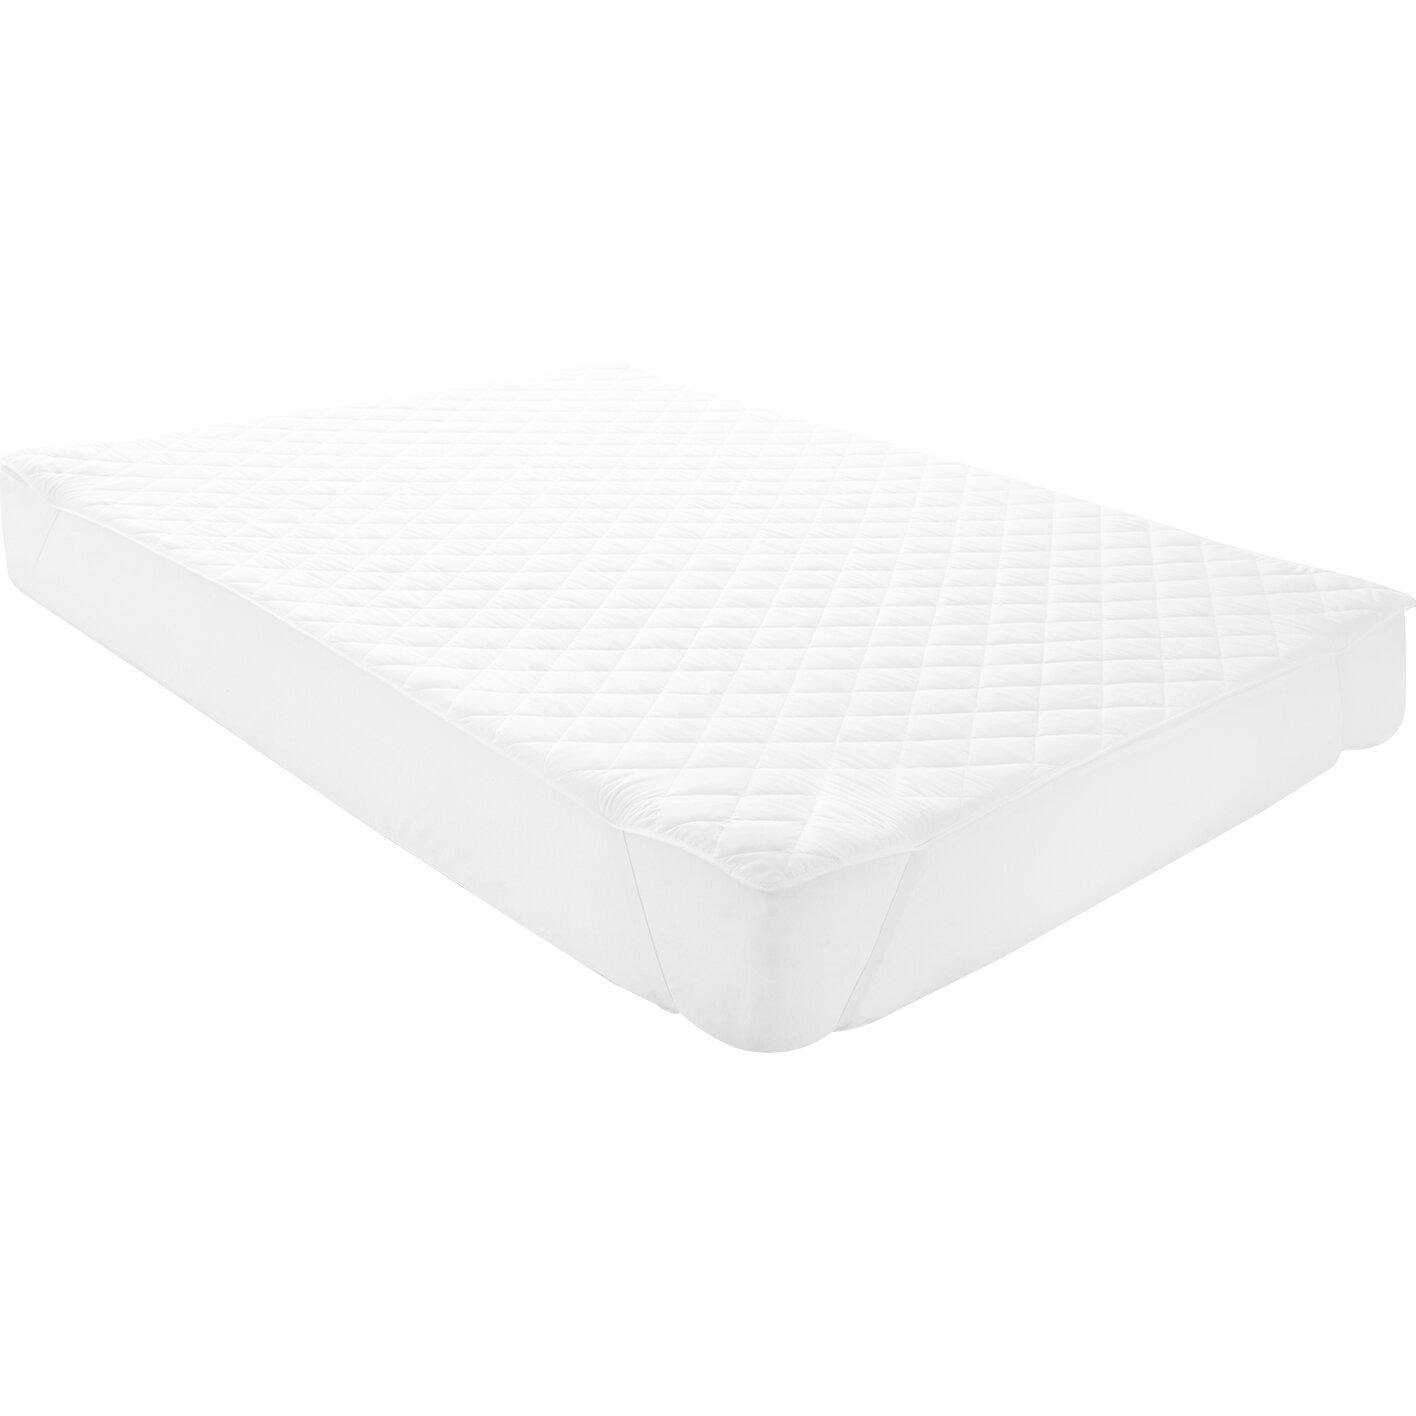 Microfiber Mattress Pad: Linenspa Waterproof Mattress Pad With Quilted Microfiber